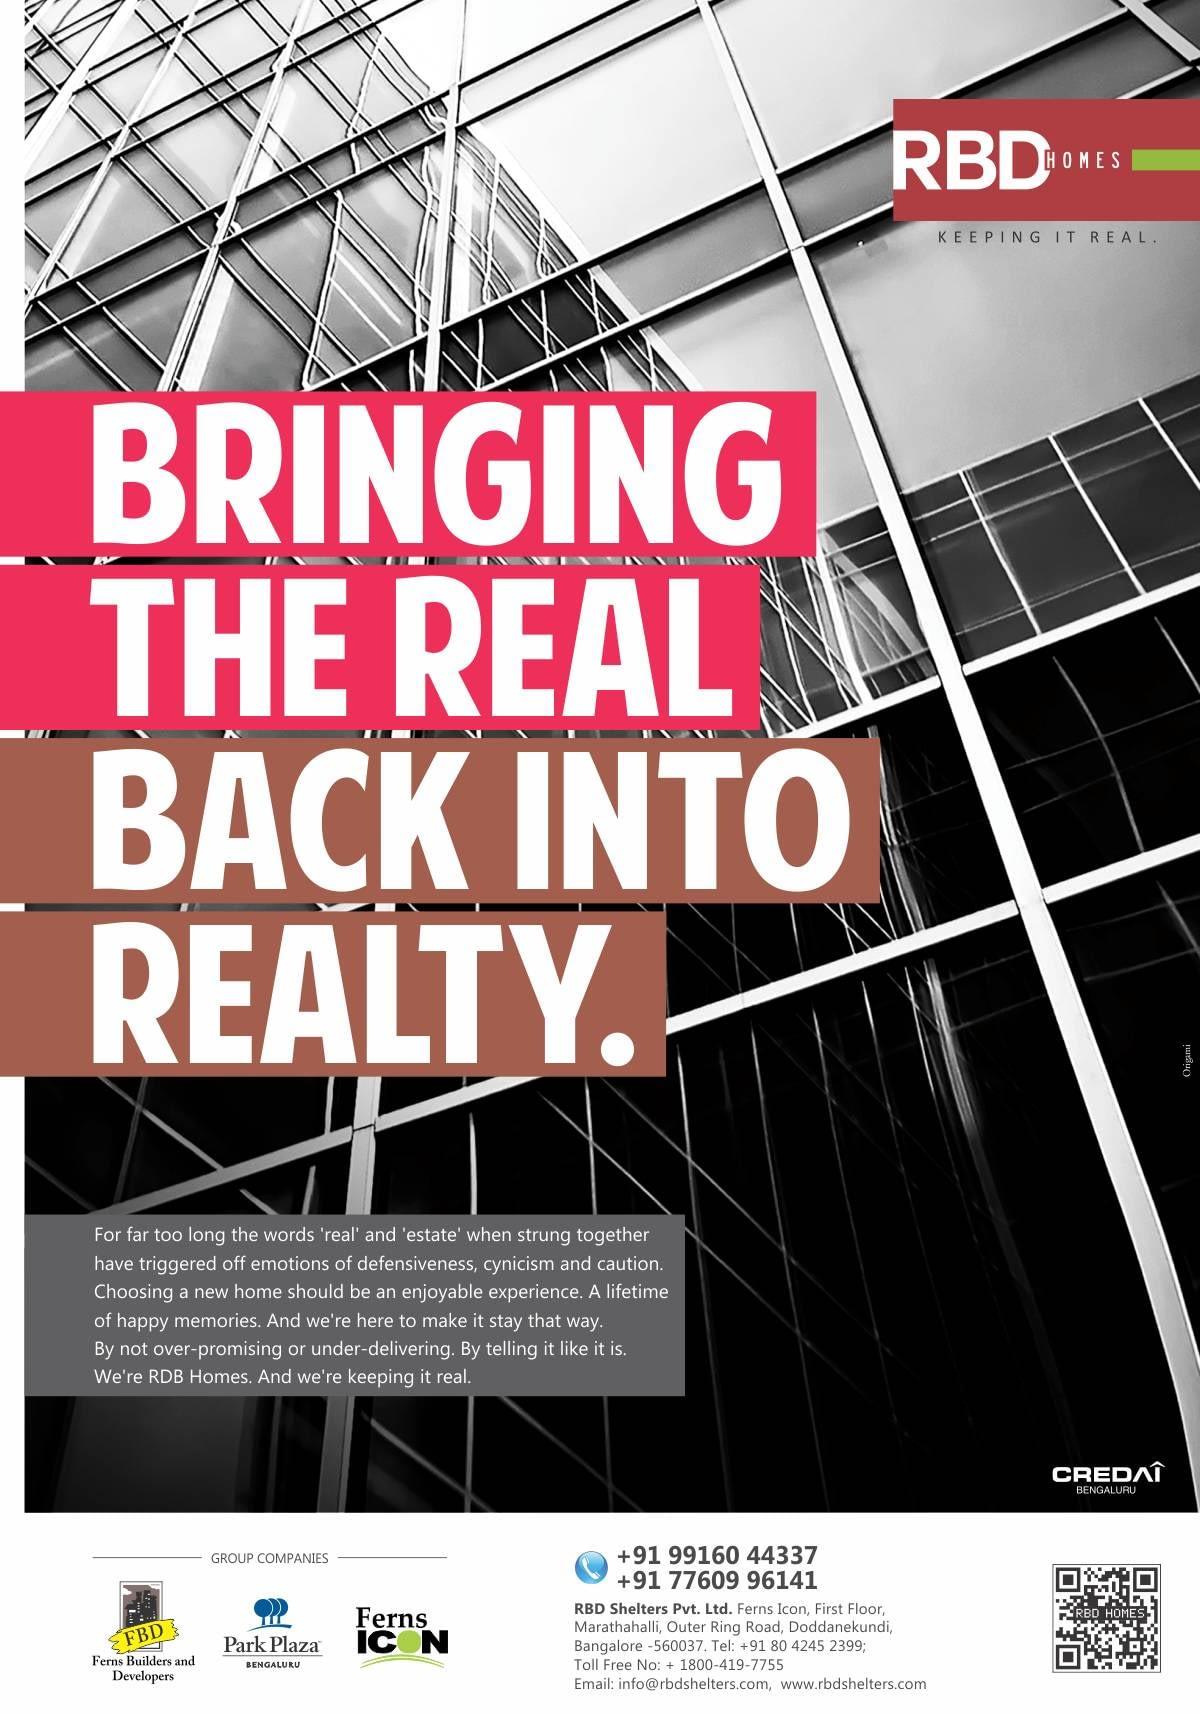 RBD Brand launch ad